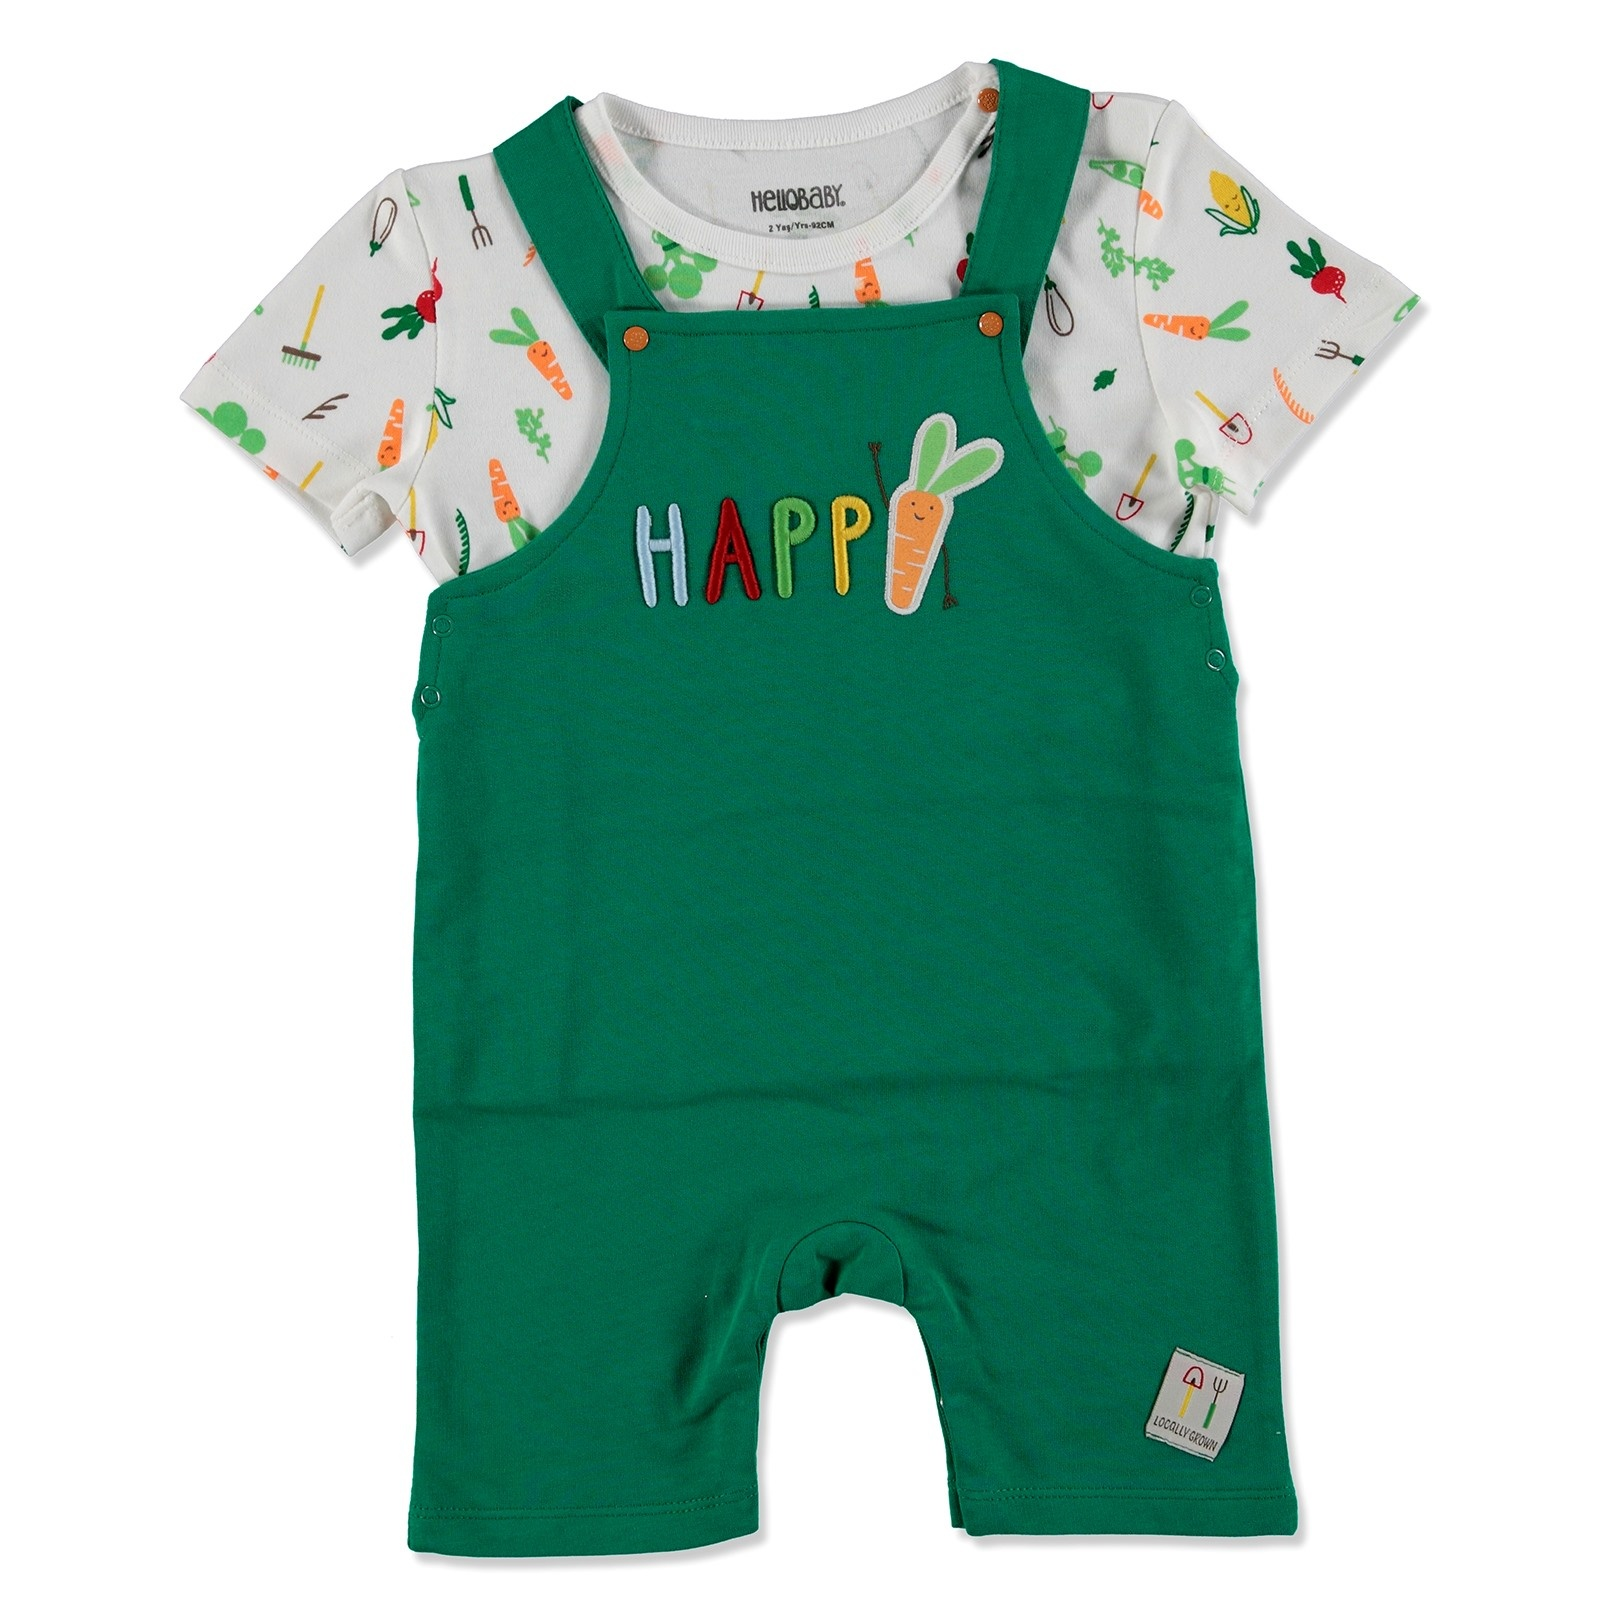 Ebebek HelloBaby Summer Baby Sweet Vegetables Sweatshirt Dungarees Set